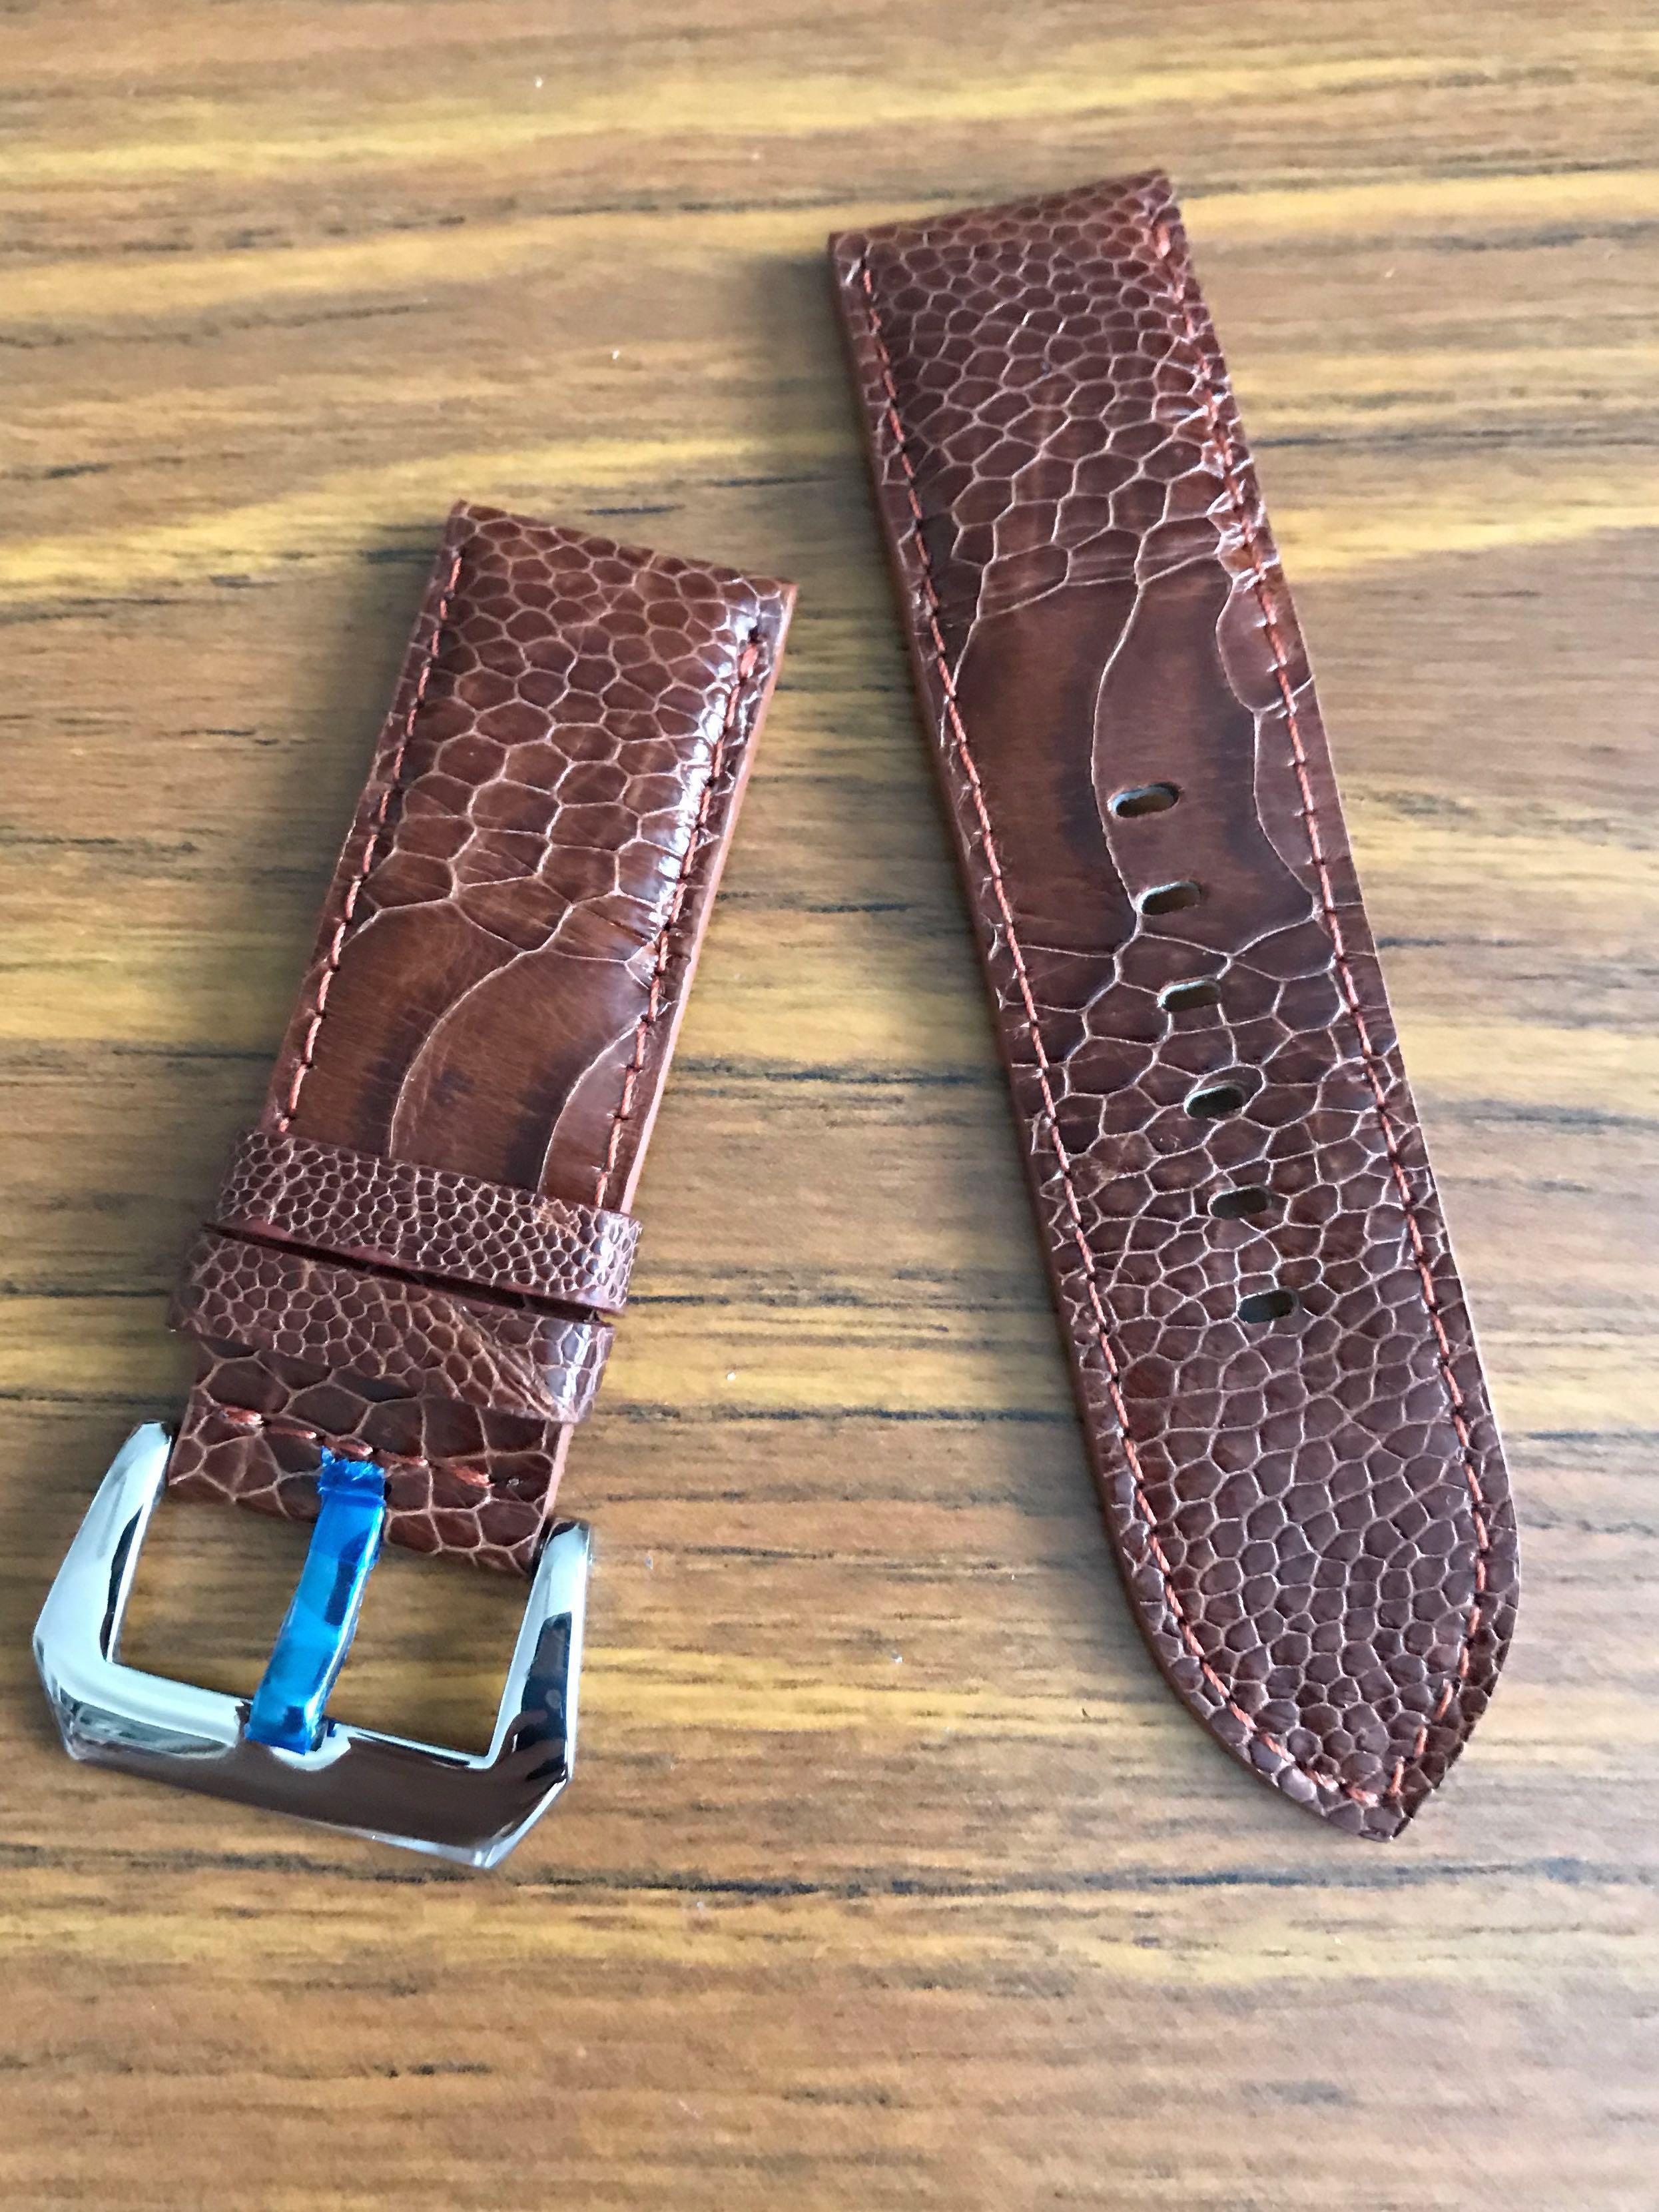 26mm/26mm Authentic Cognac Brown Ostrich Leg Watch Strap #MRTHougang #MRTSerangoon #MRTSengkang #MRTPunggol #MRTRaffles #MRTBedok #MRTTampines #MRTCCK #MRTJurongEast #MRTYishun